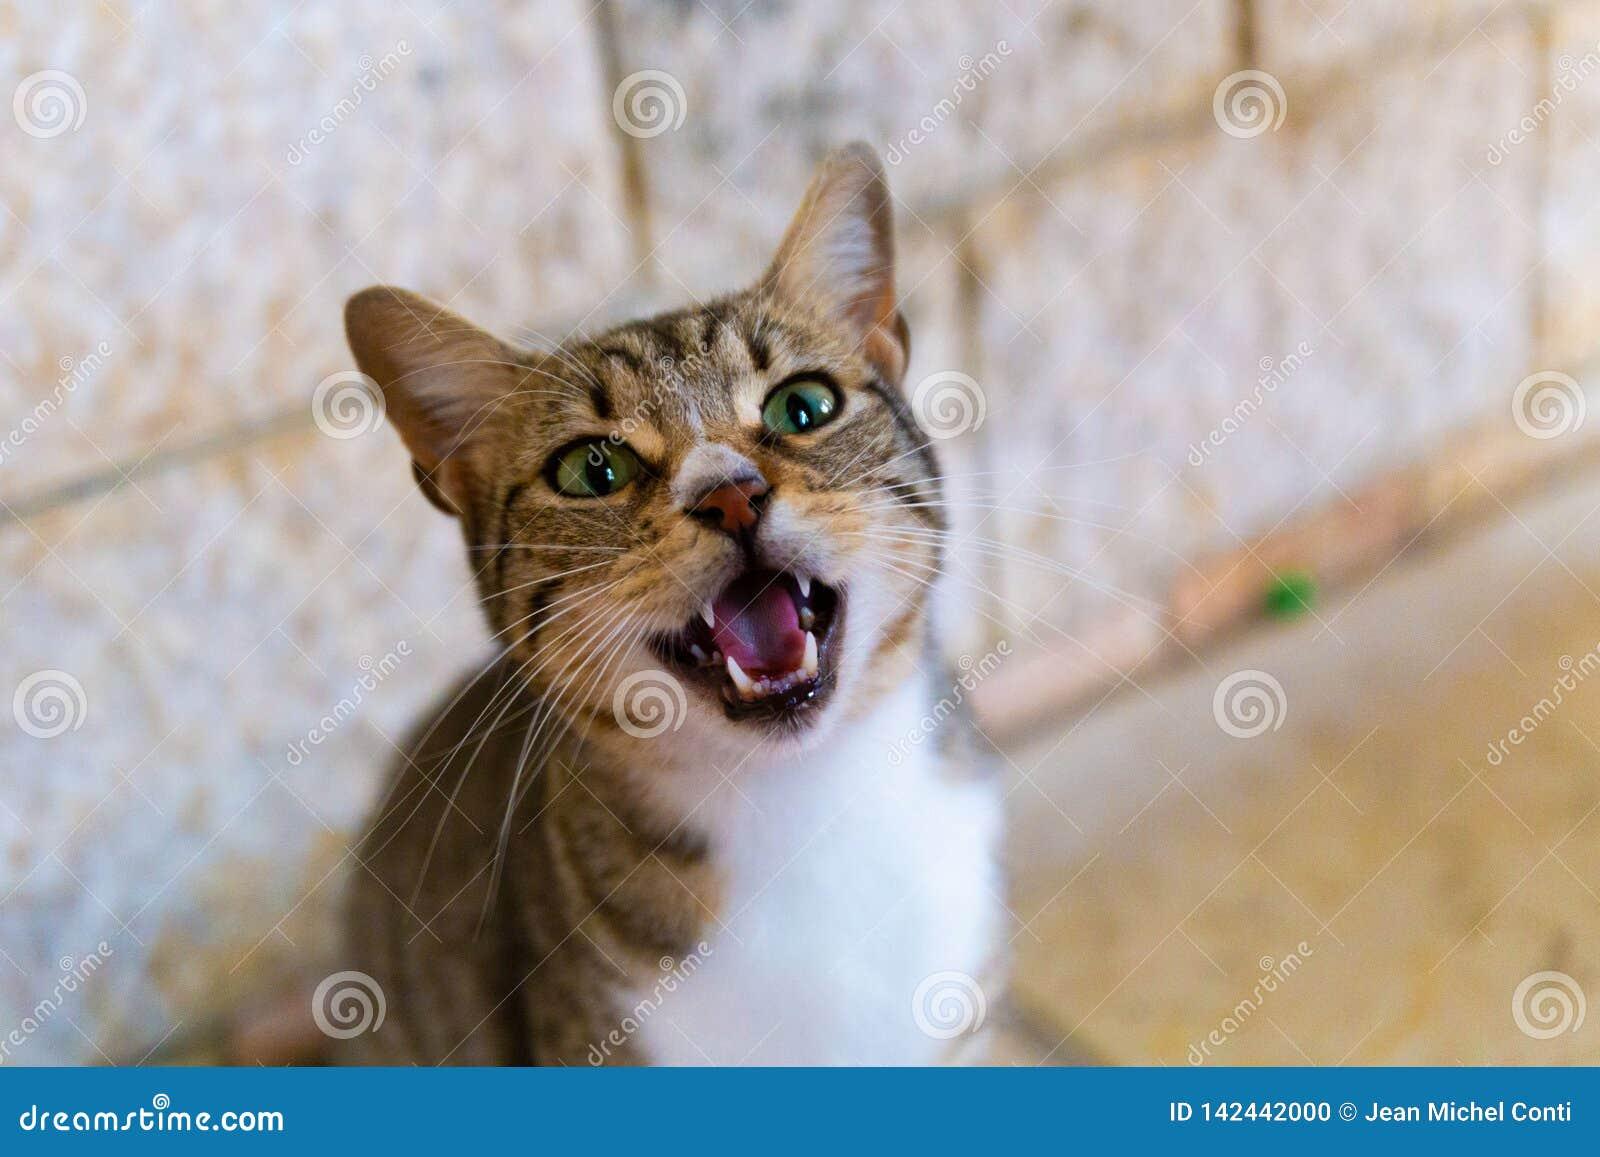 Meowing кот в Назарете Израиле